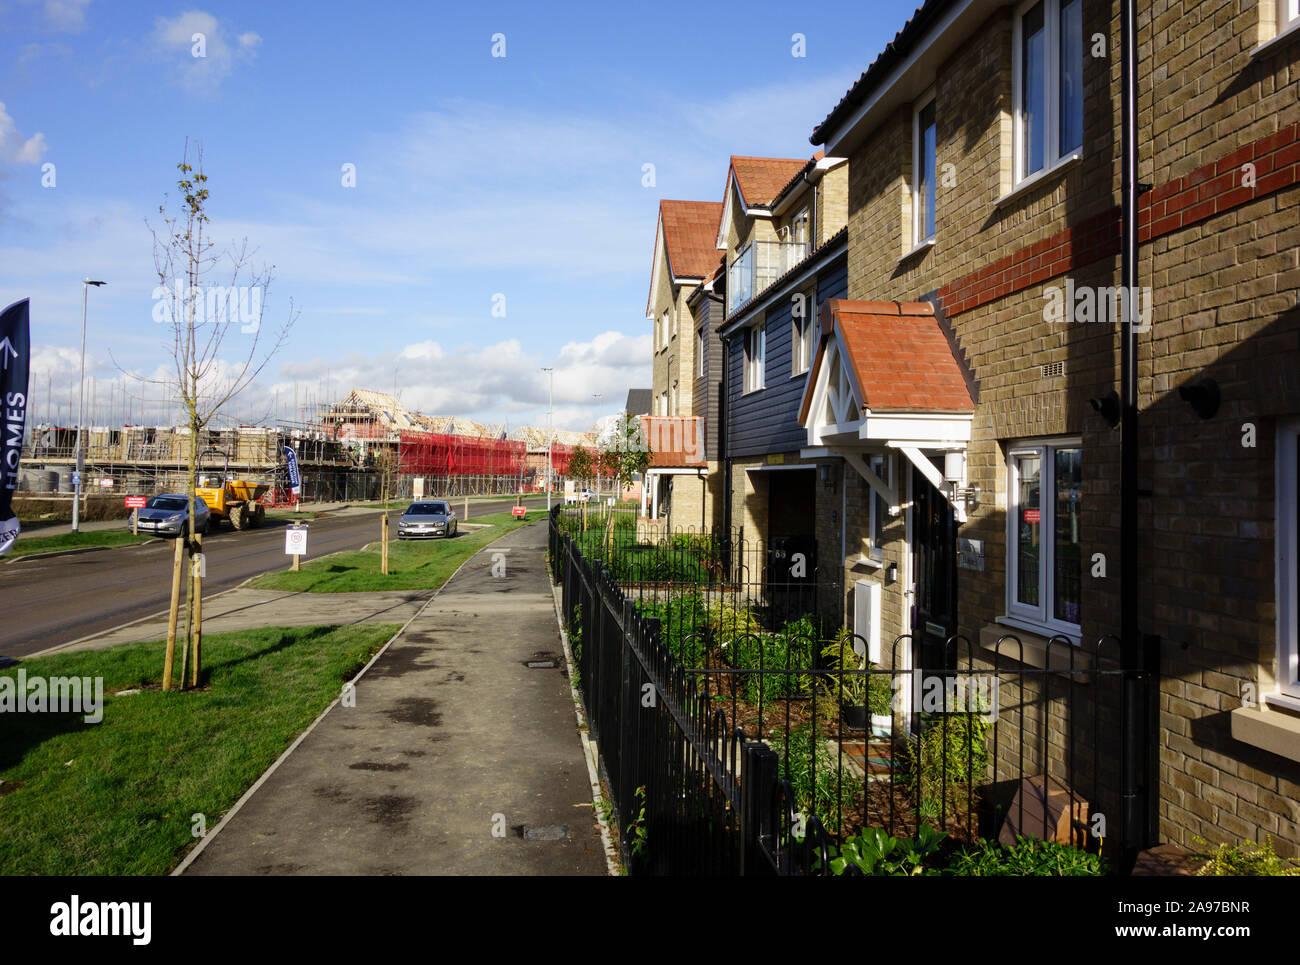 857 homes available at stortfordfields, housing development employment land, shops, community facilities in Bishops Stortford, Hertfordshire, England Stock Photo